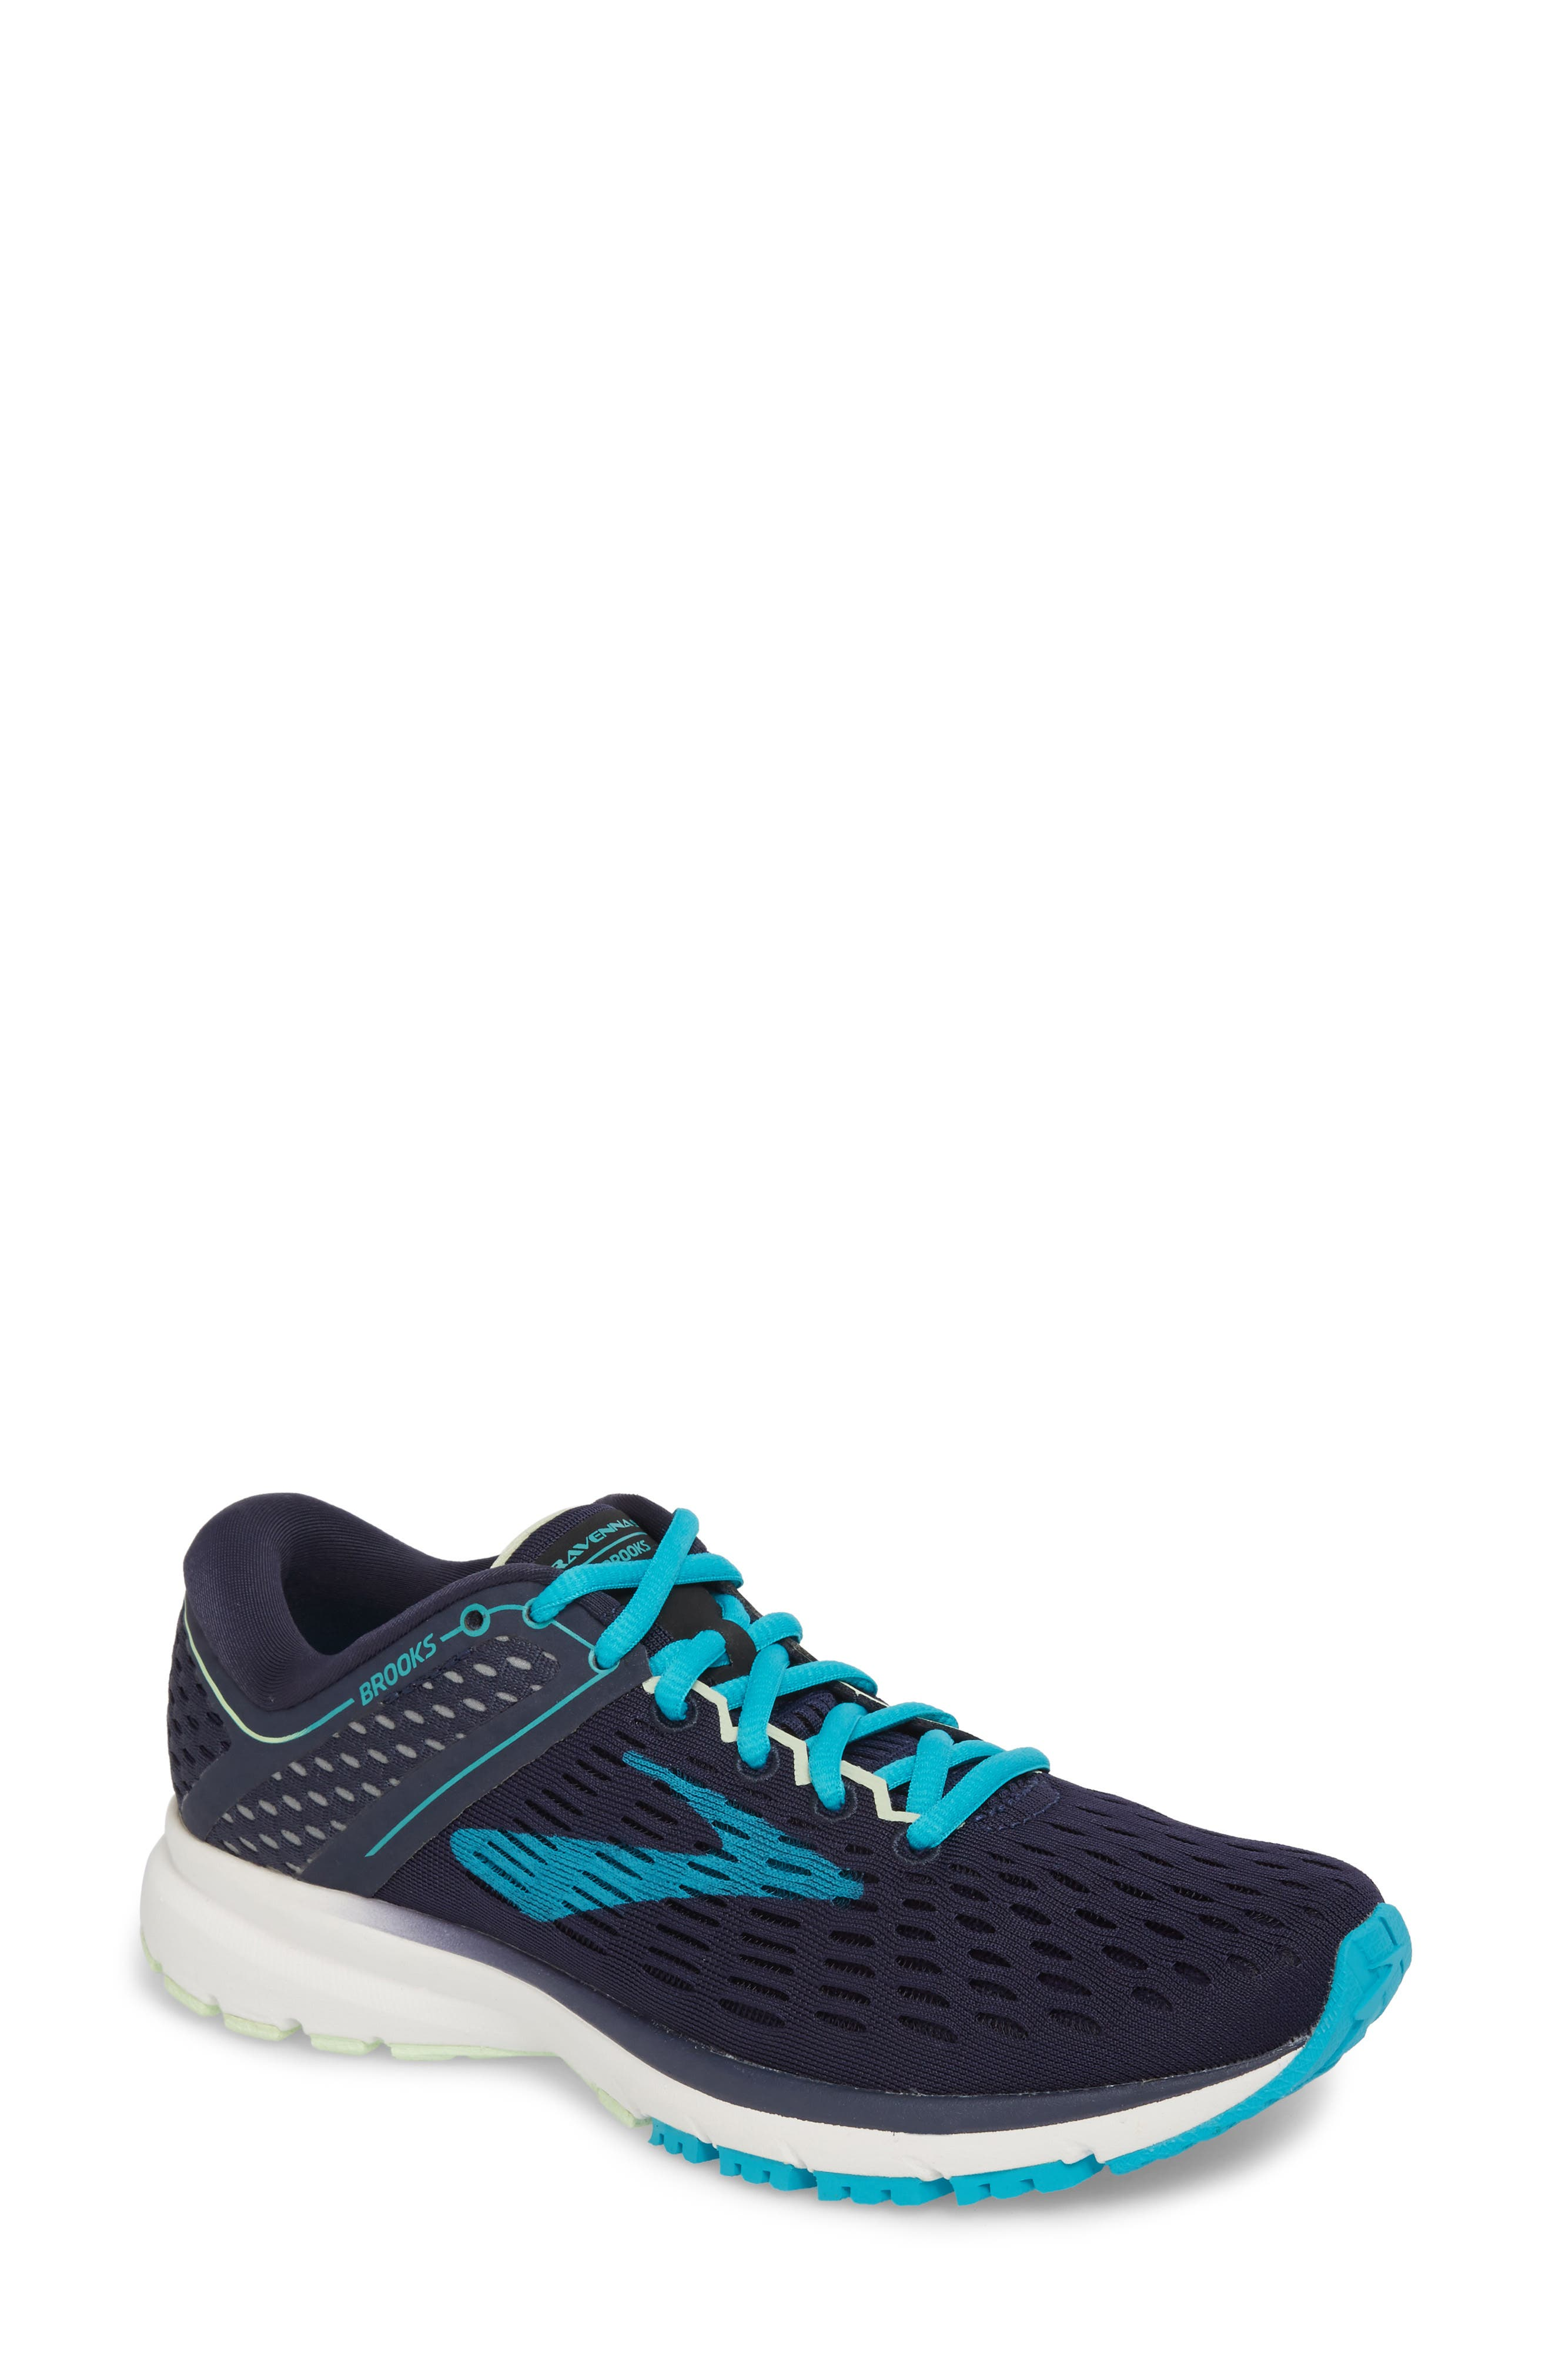 Brooks Ravenna 9 Running Shoe B - Blue